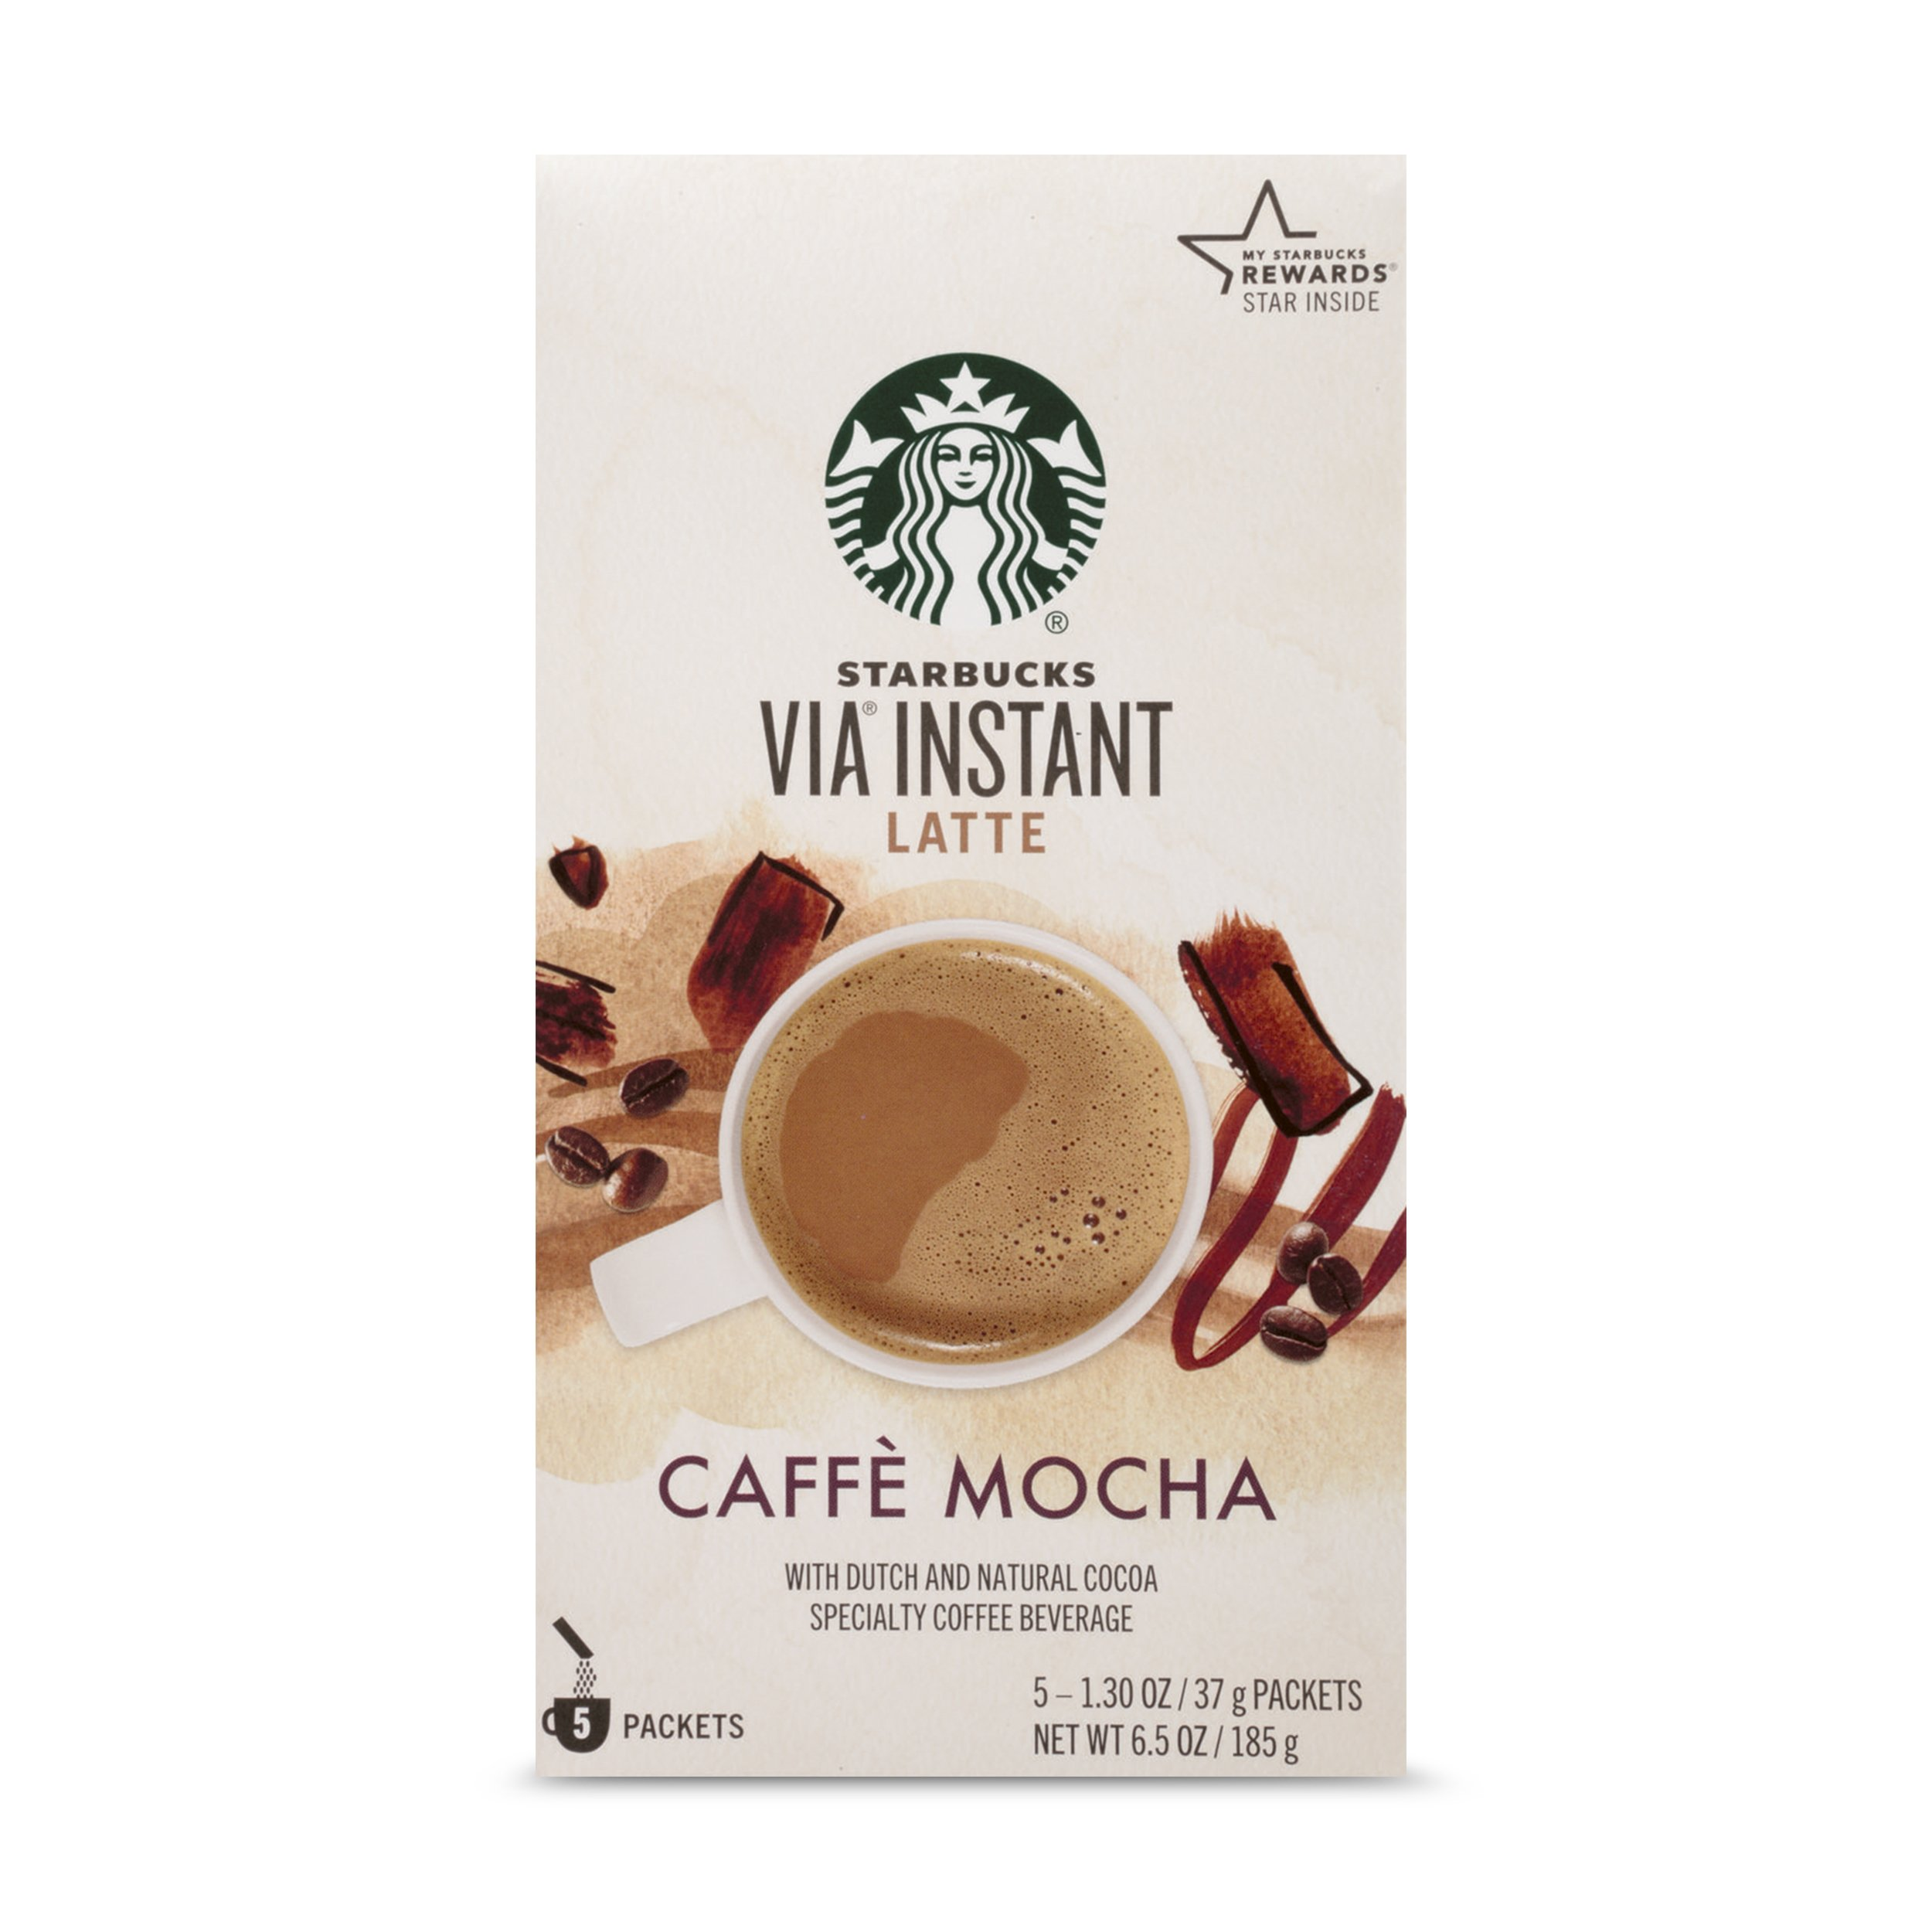 Starbucks VIA Instant Coffee, Mocha Latte, 5 Count